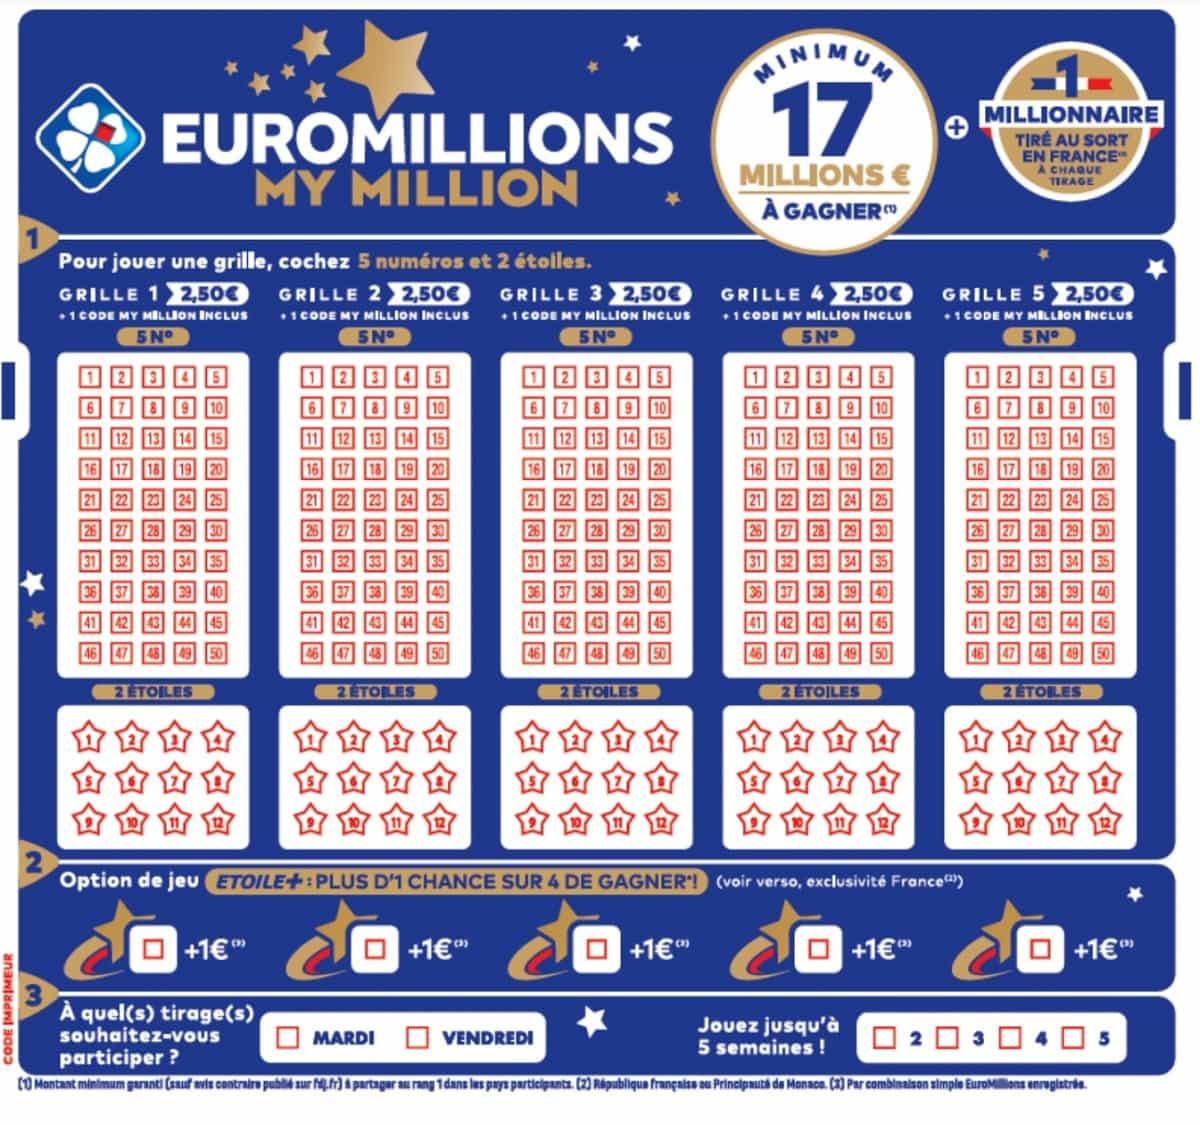 Hatoslottó results, jackpots & fun facts!